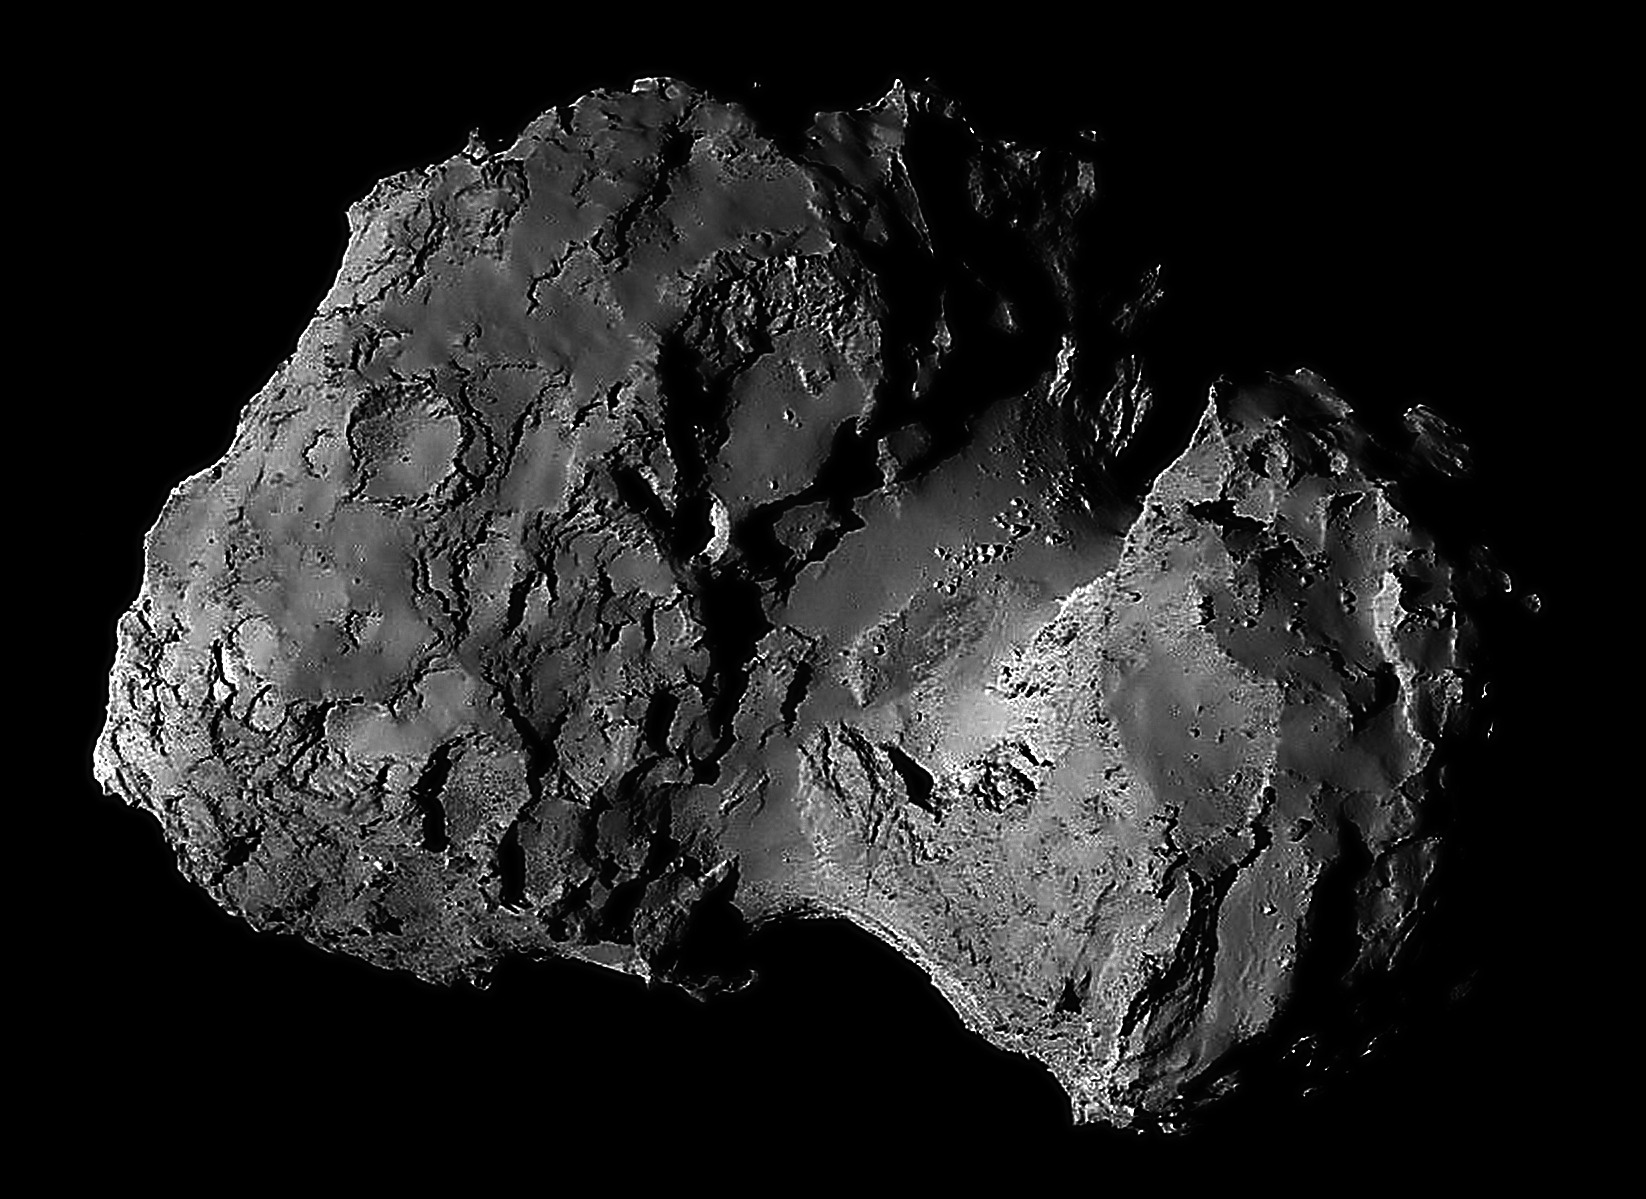 ROSETTA arrives at 67P | Cumbrian Sky Rosetta